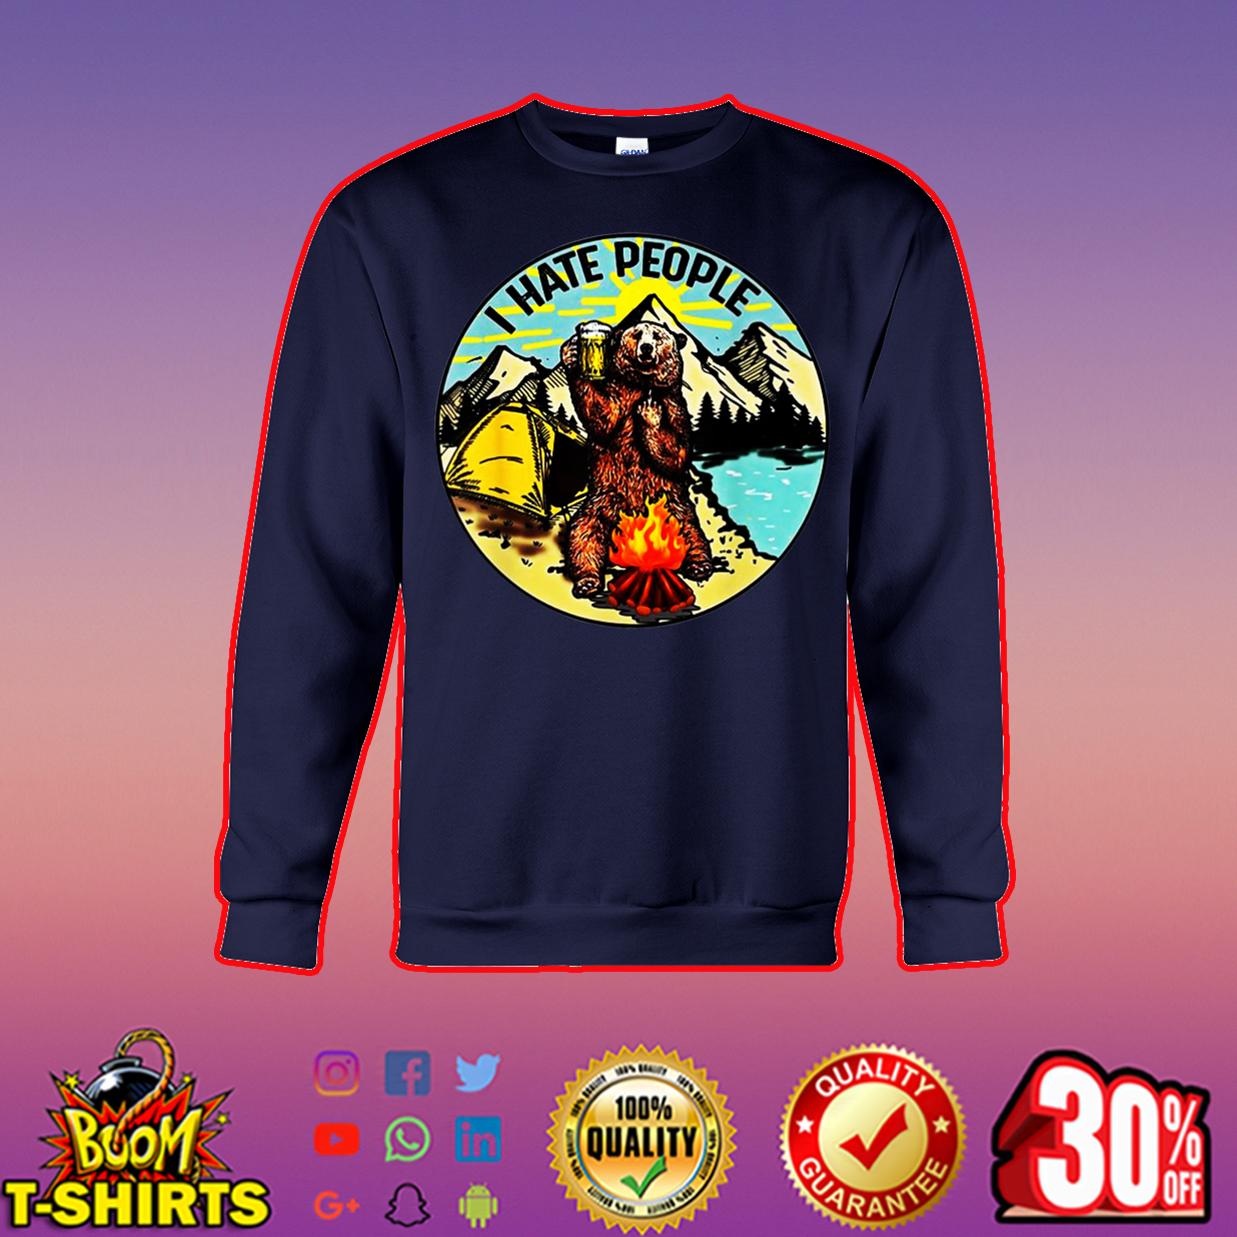 Bear camping I Hate People sweatshirt